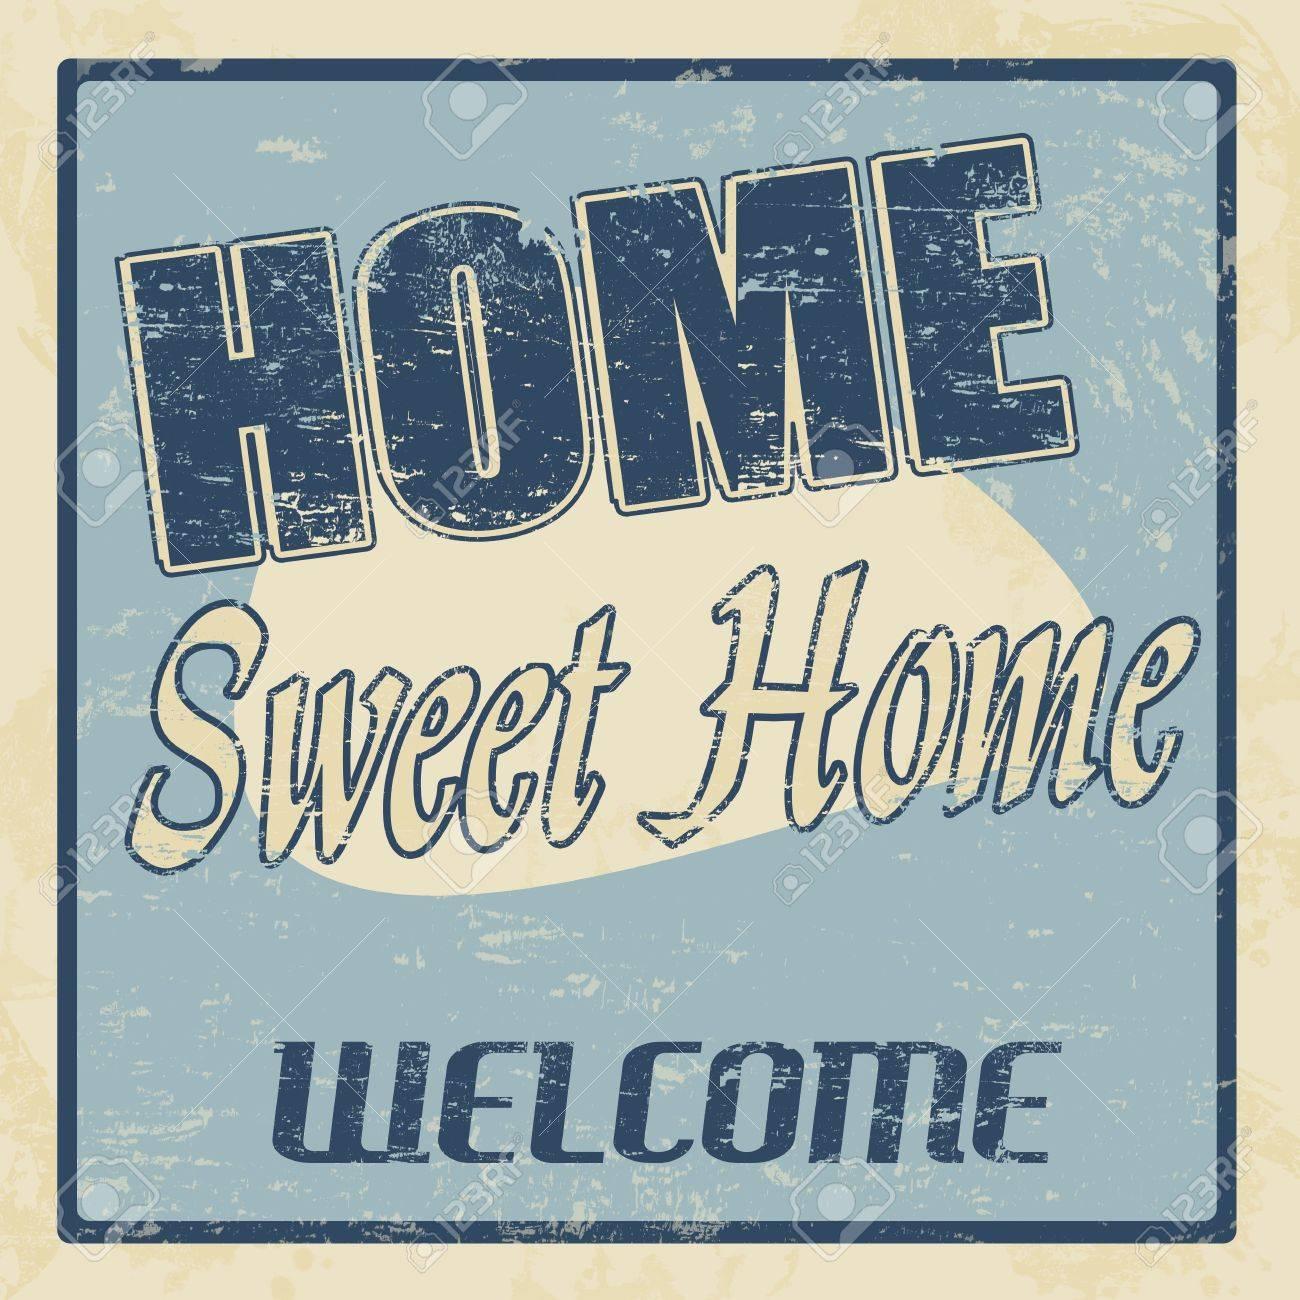 Vintage home sweet home vintage retro grunge poster, illustrator Stock Vector - 18119283